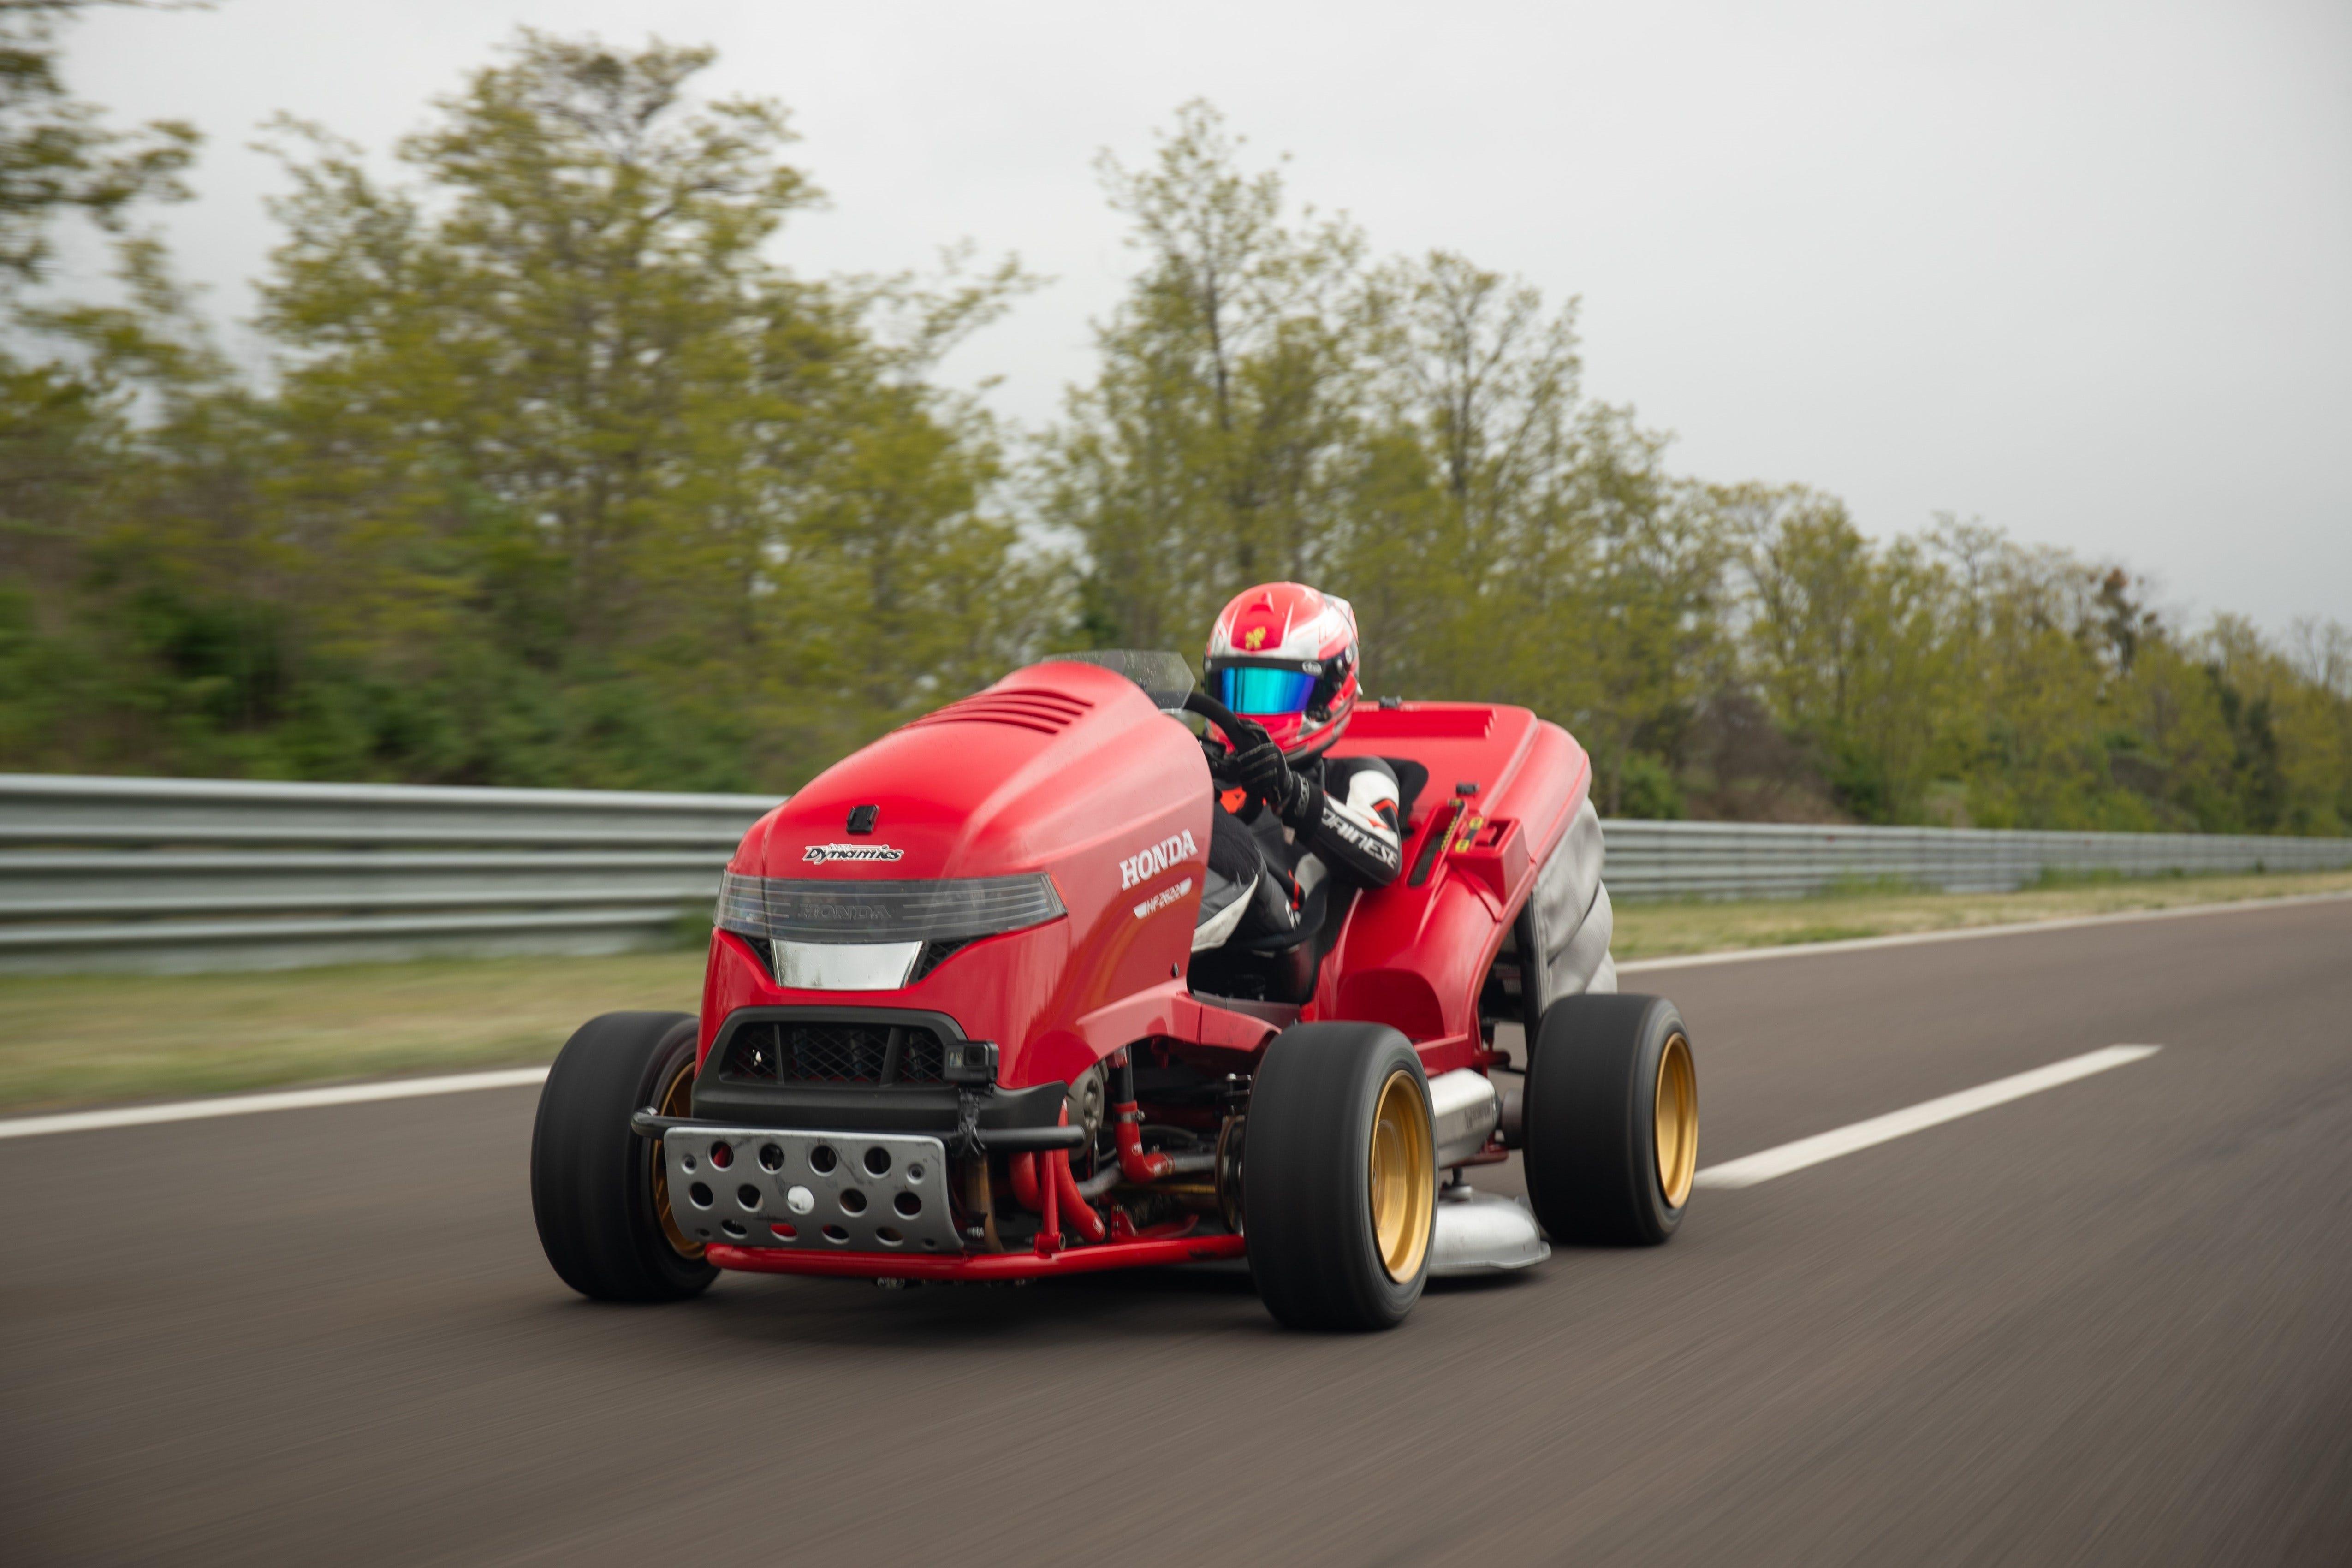 Honda S Fastest Lawnmower Breaks World Record For Speed